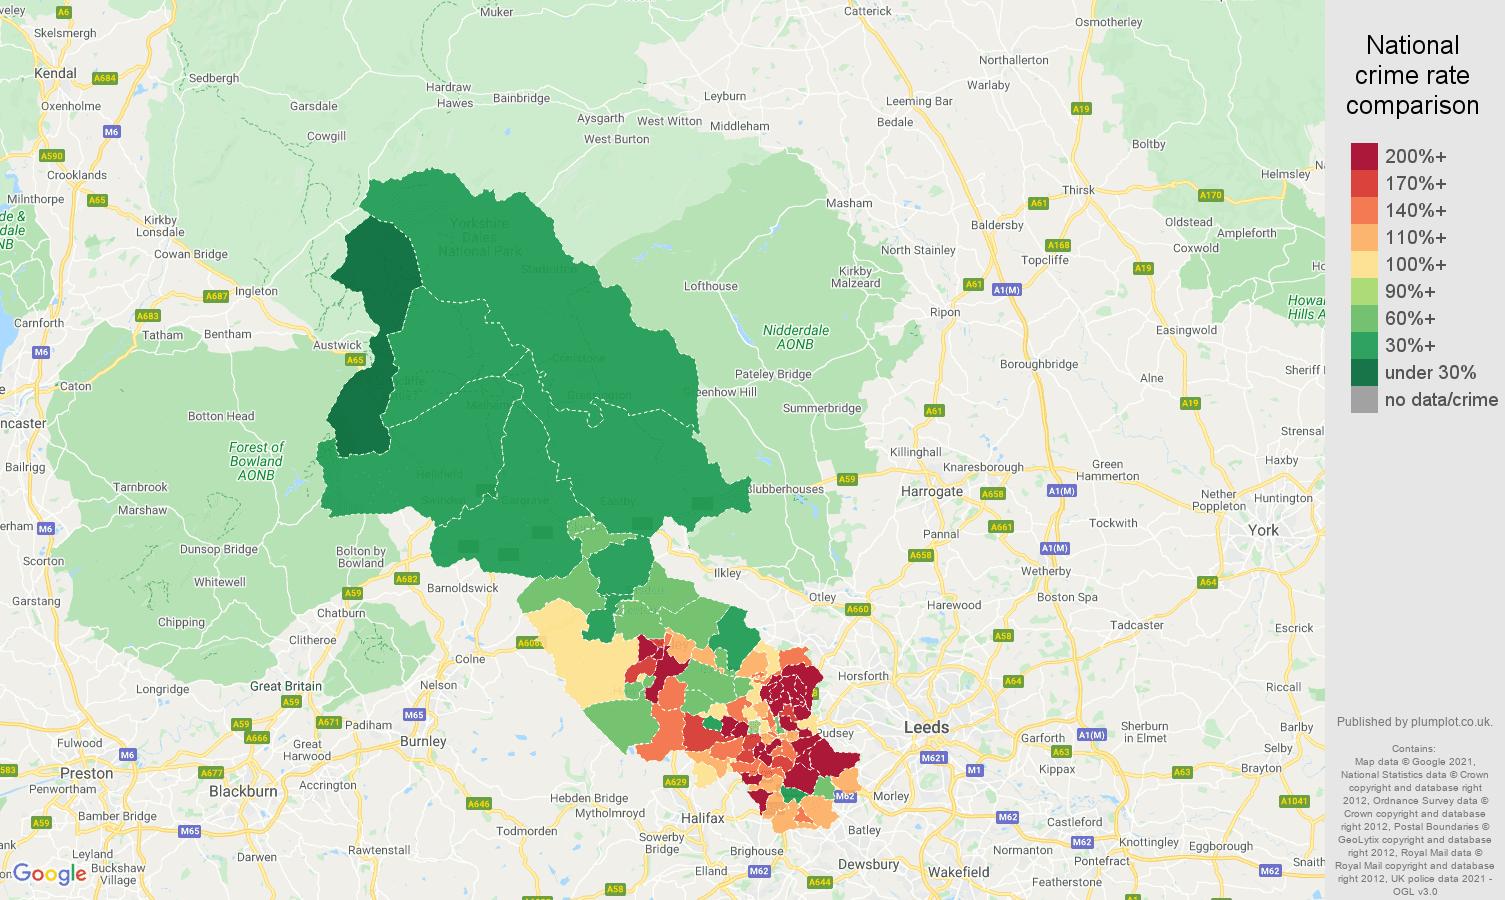 Bradford criminal damage and arson crime rate comparison map